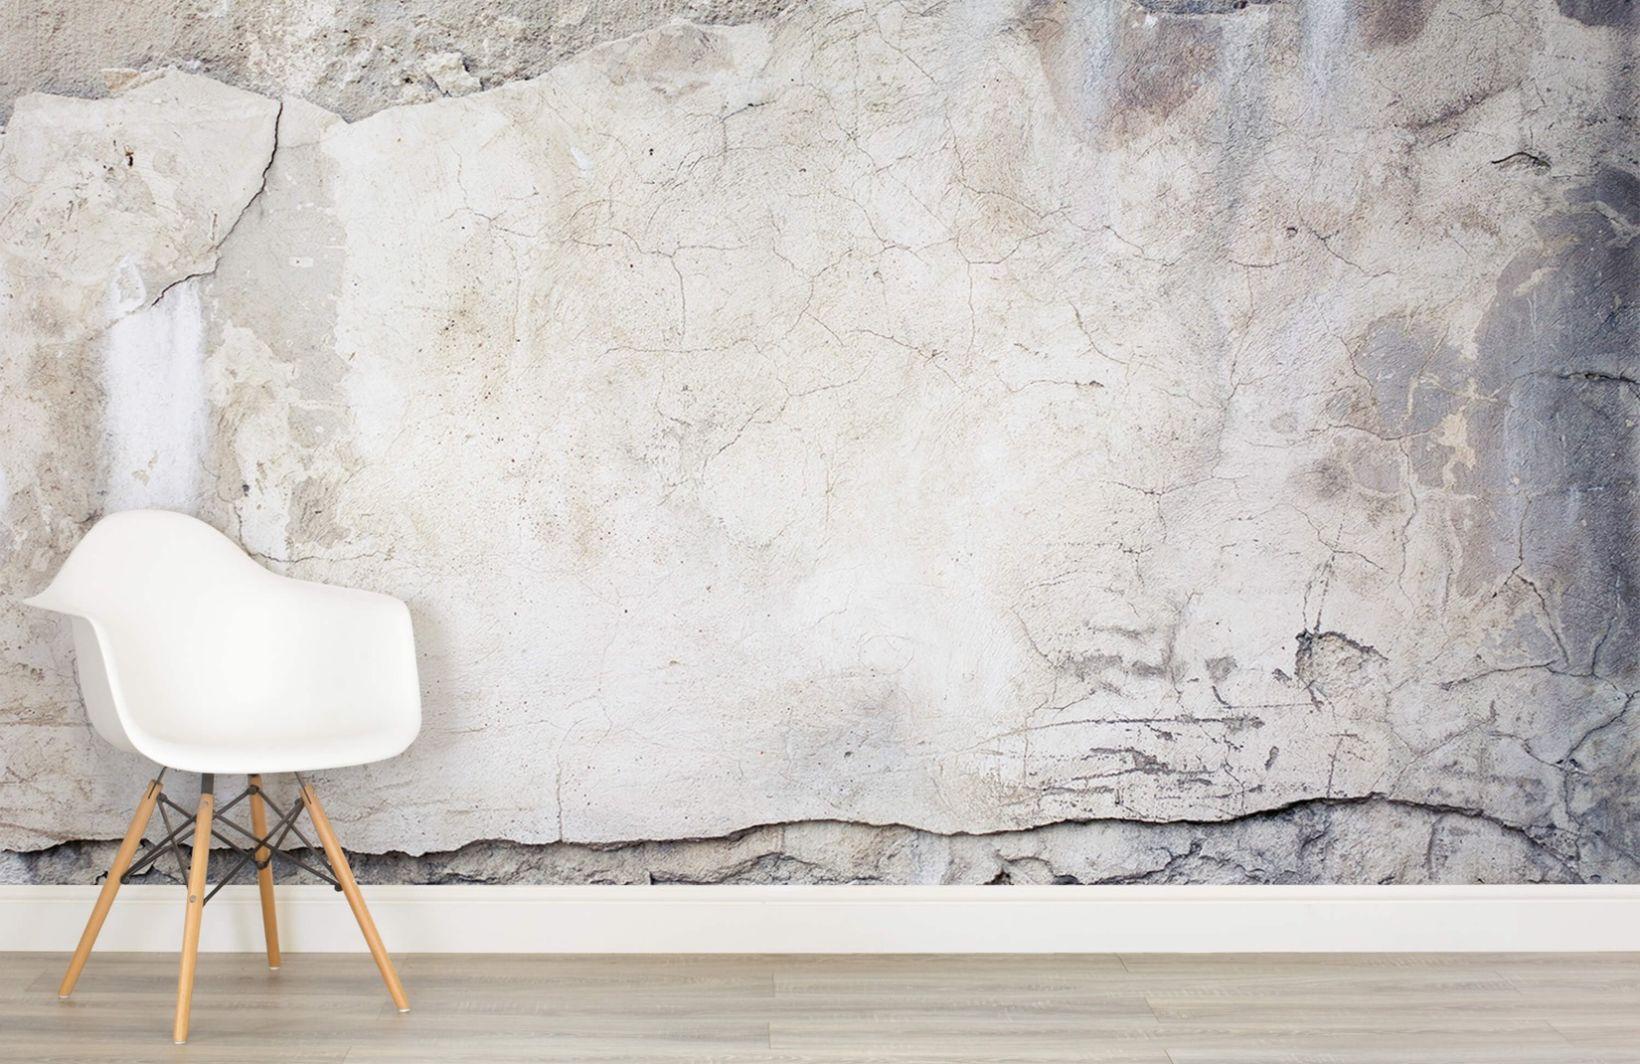 Cracked Concrete Wallpaper Broken Concrete Effect Muralswallpaper Concrete Wall Concrete Wallpaper Interior Design Rustic